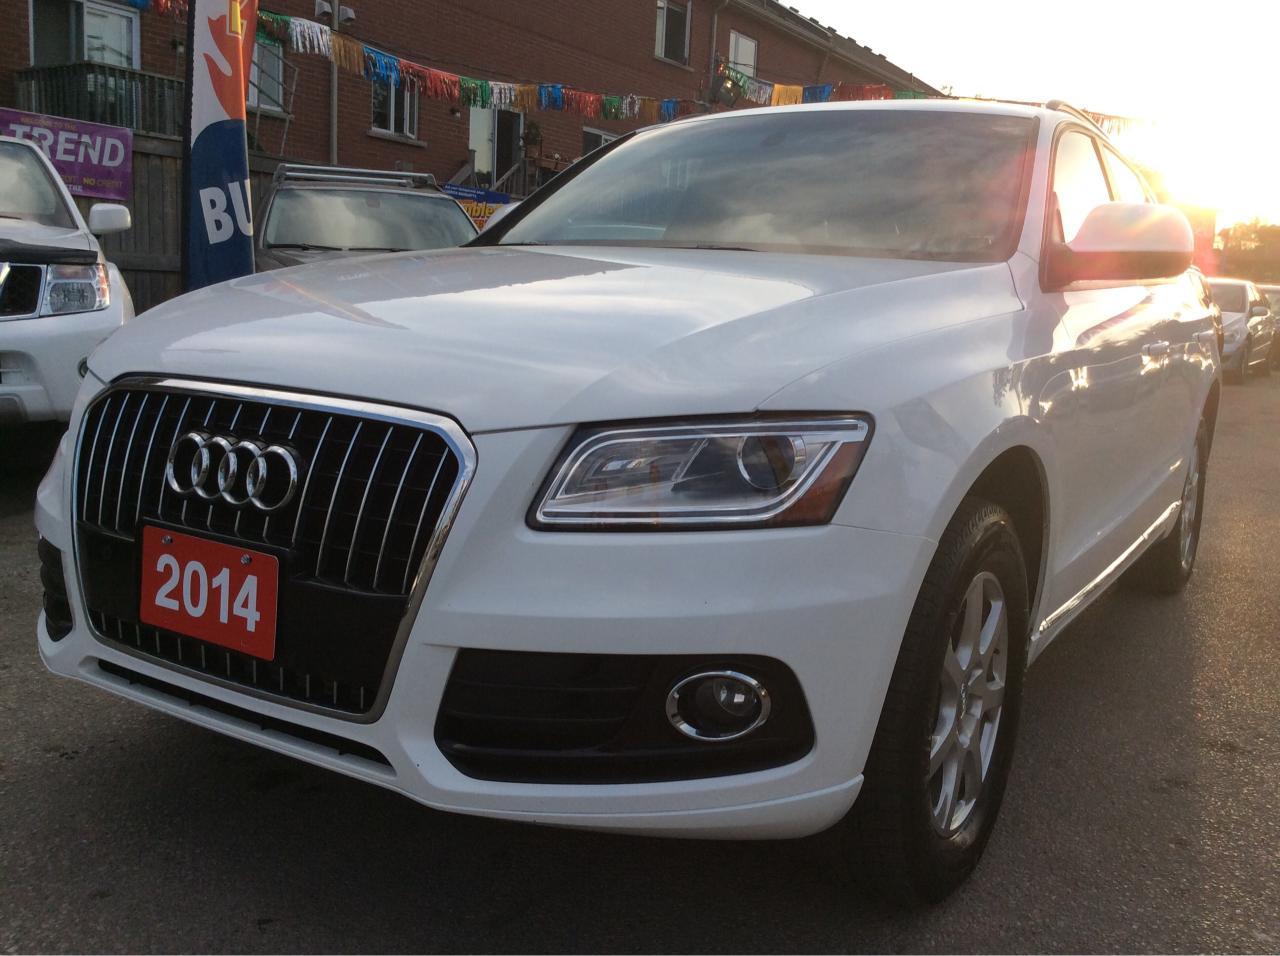 2014 Audi Q5 2.0L Komfort/AWD/Alloys/Power Seats/Backup Sensor